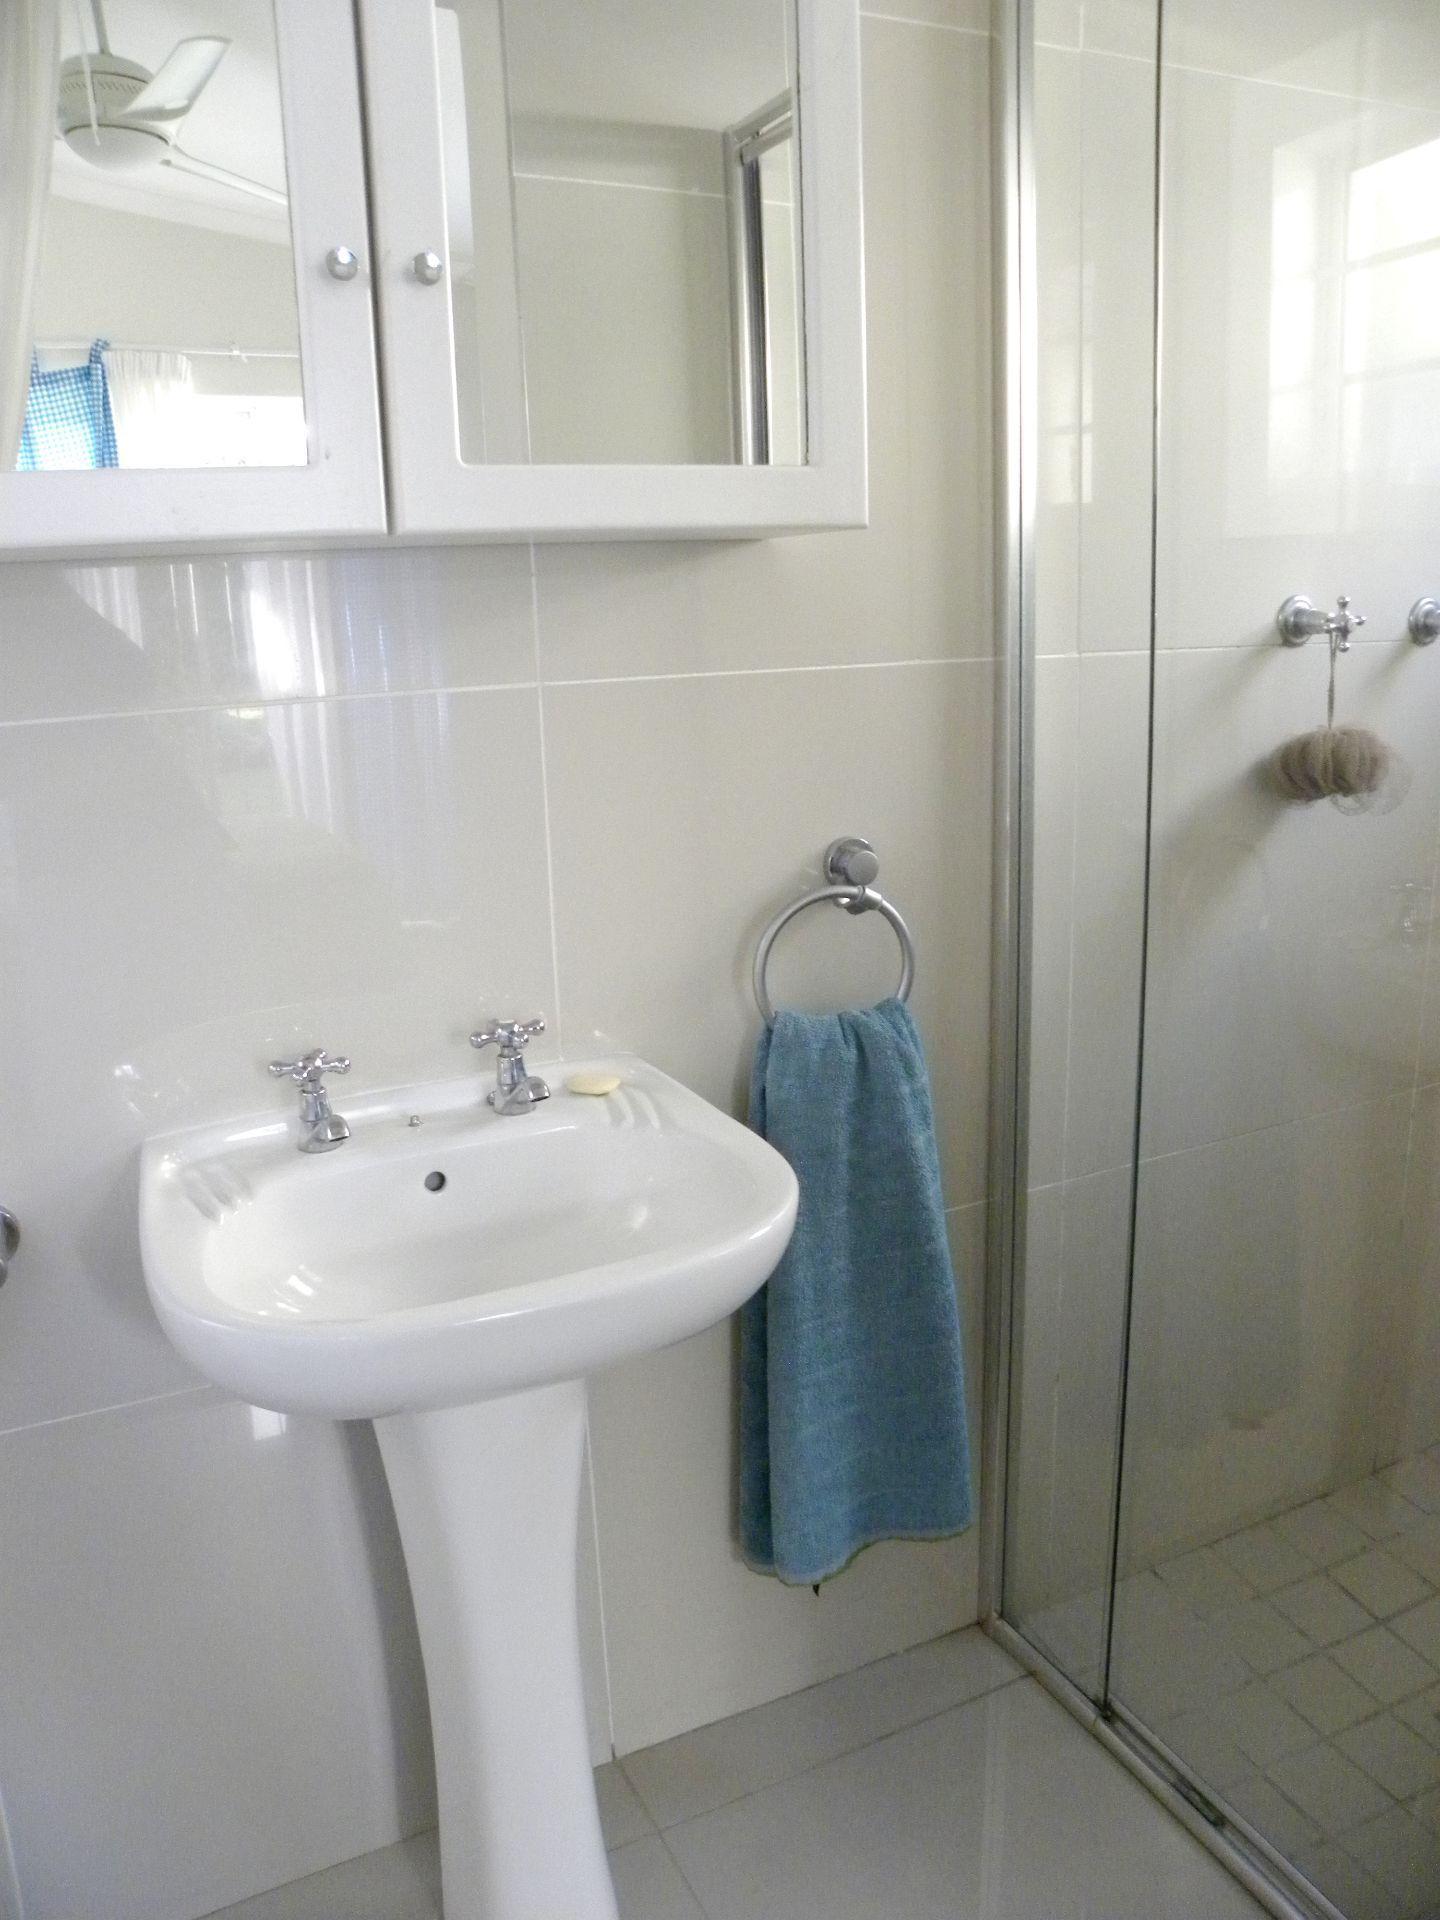 Bonnie Doone property for sale. Ref No: 13501808. Picture no 21